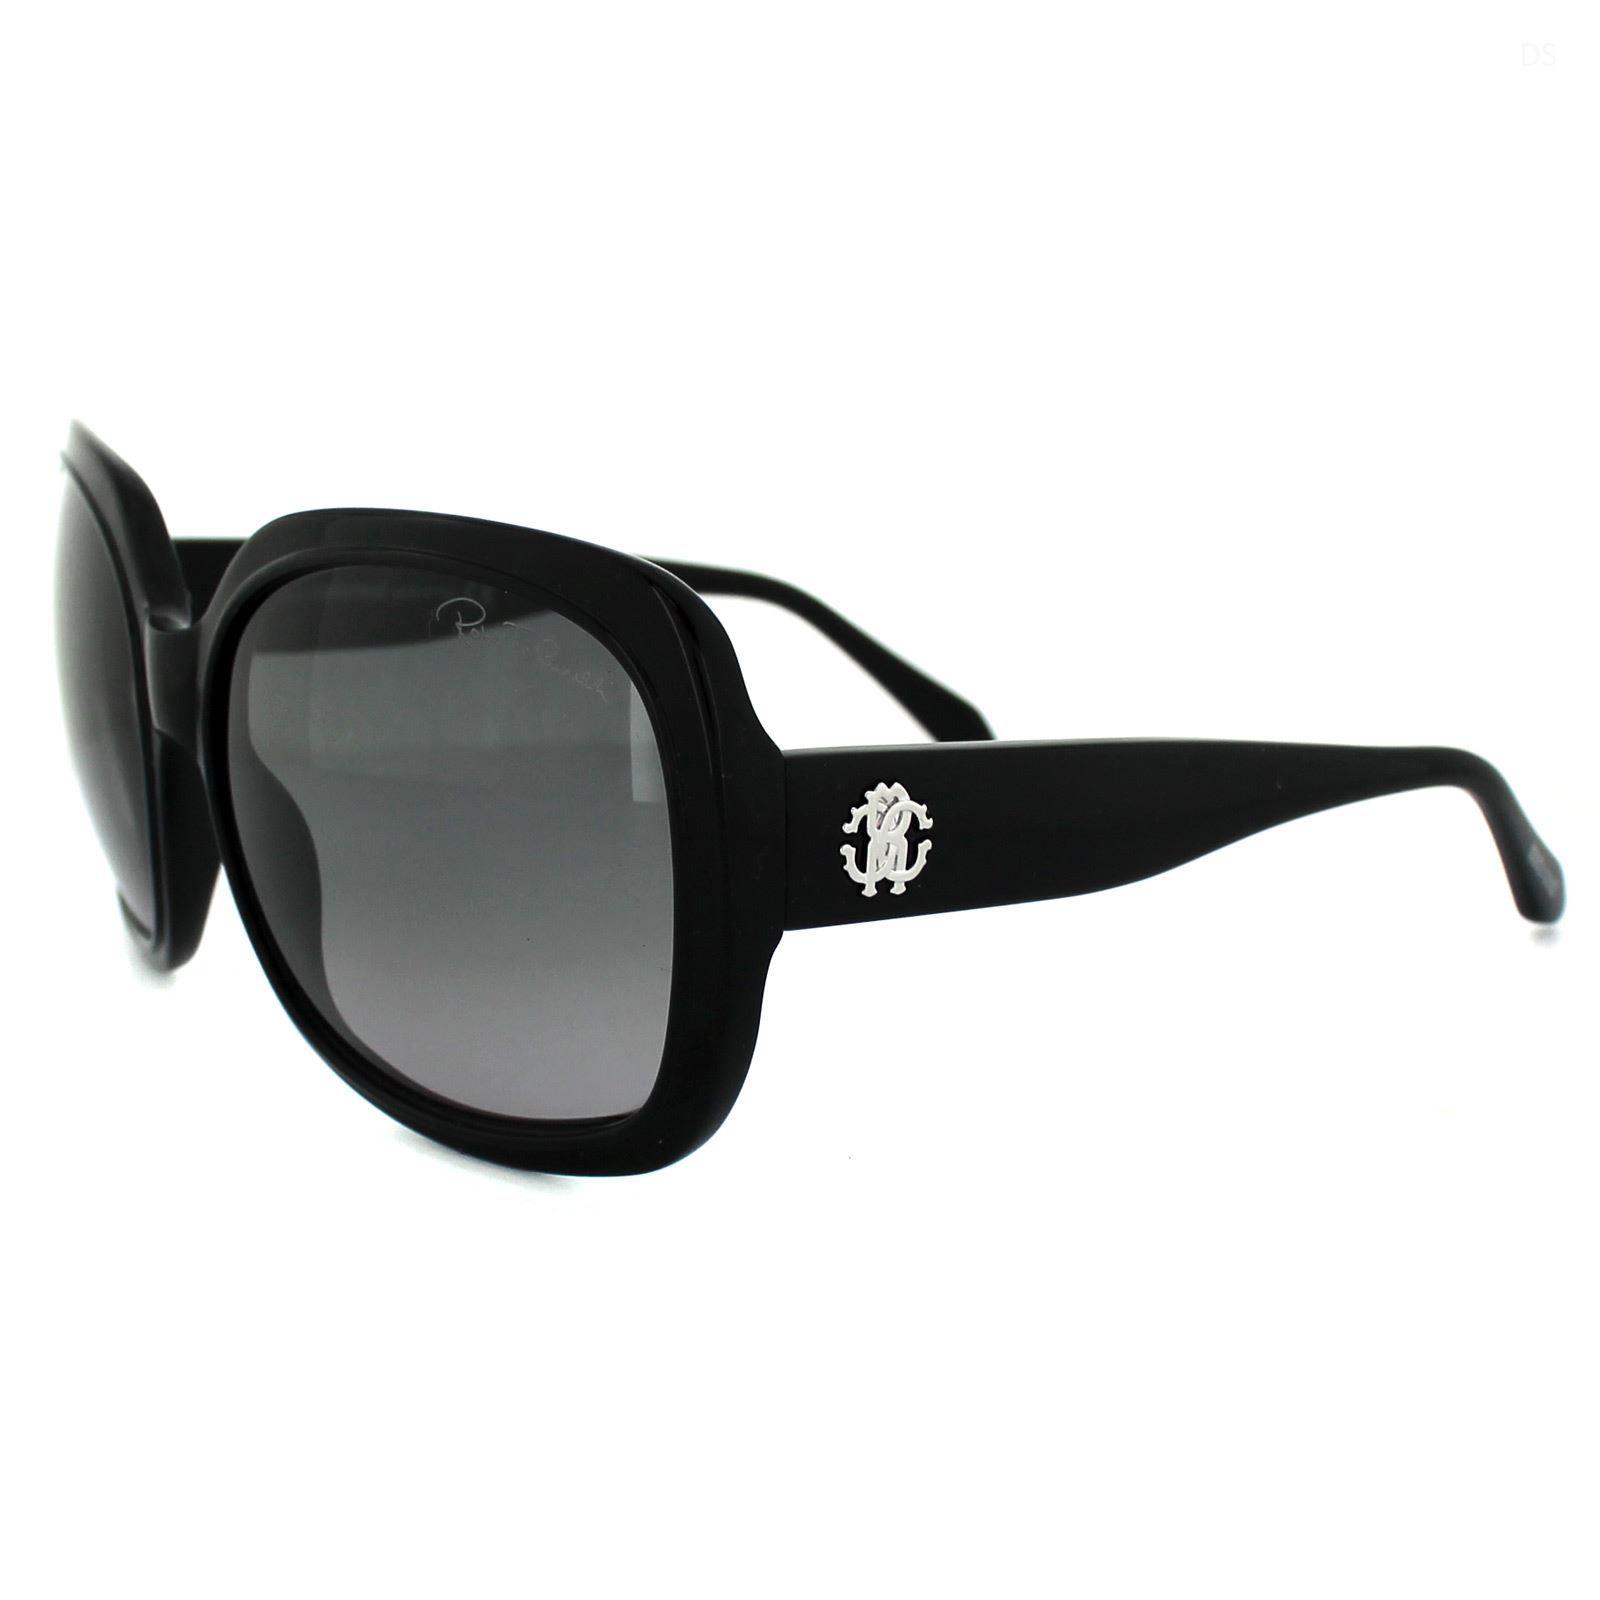 Roberto Cavalli Sunglasses Male 729 01B Black Grey Gradient